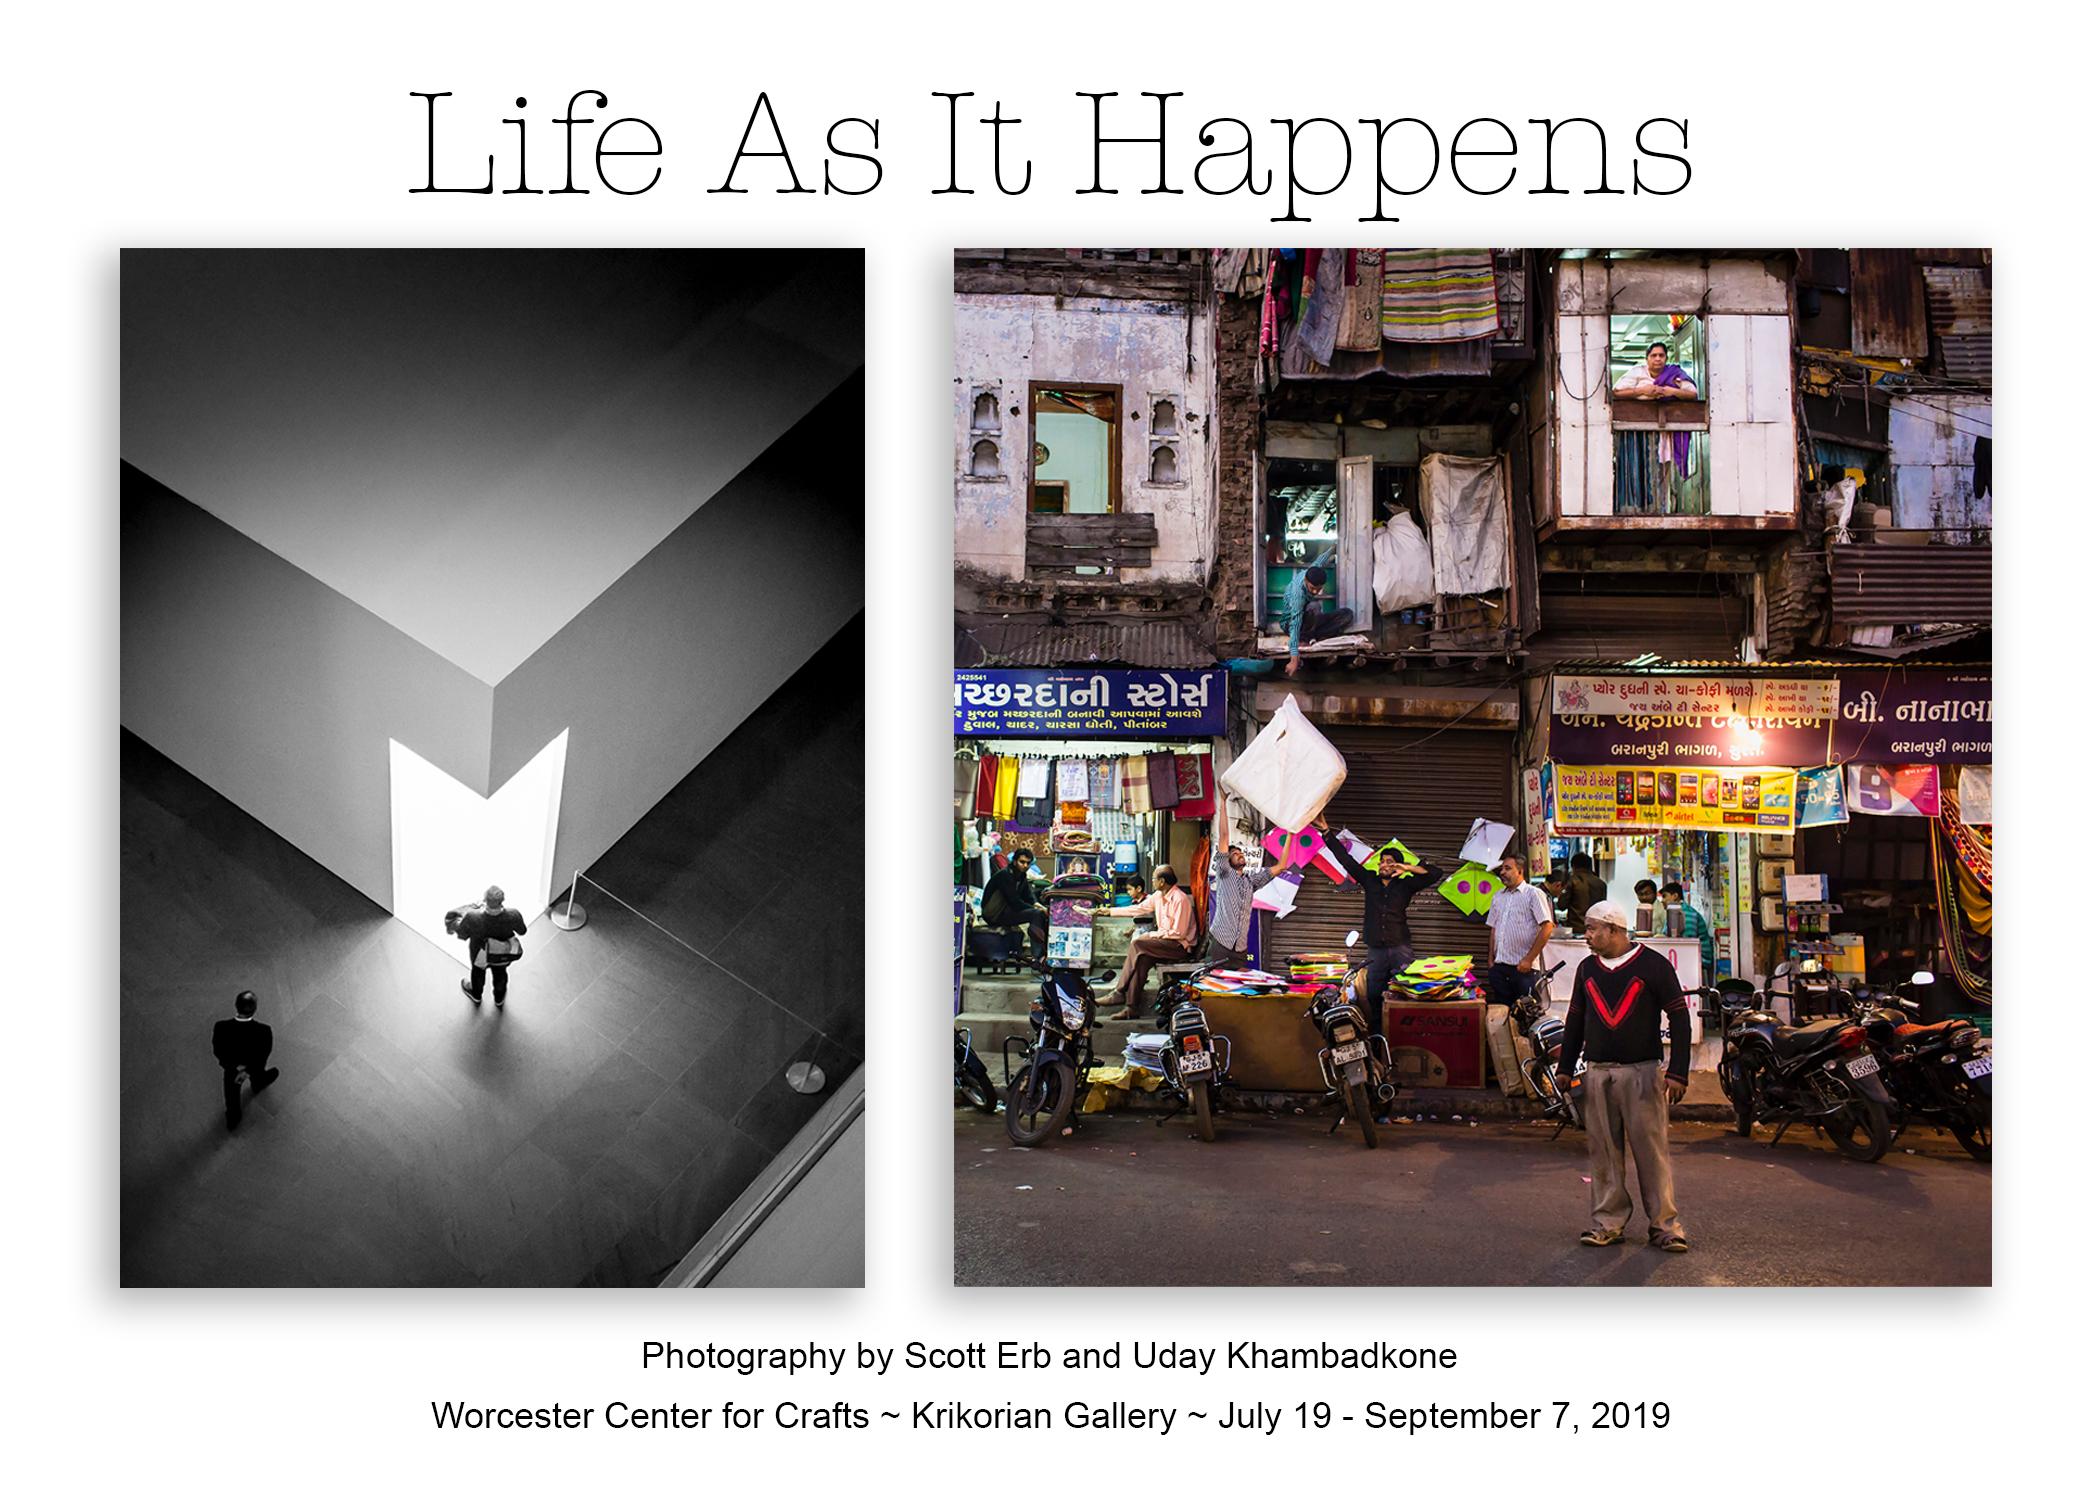 Life as it happens postcard.jpg